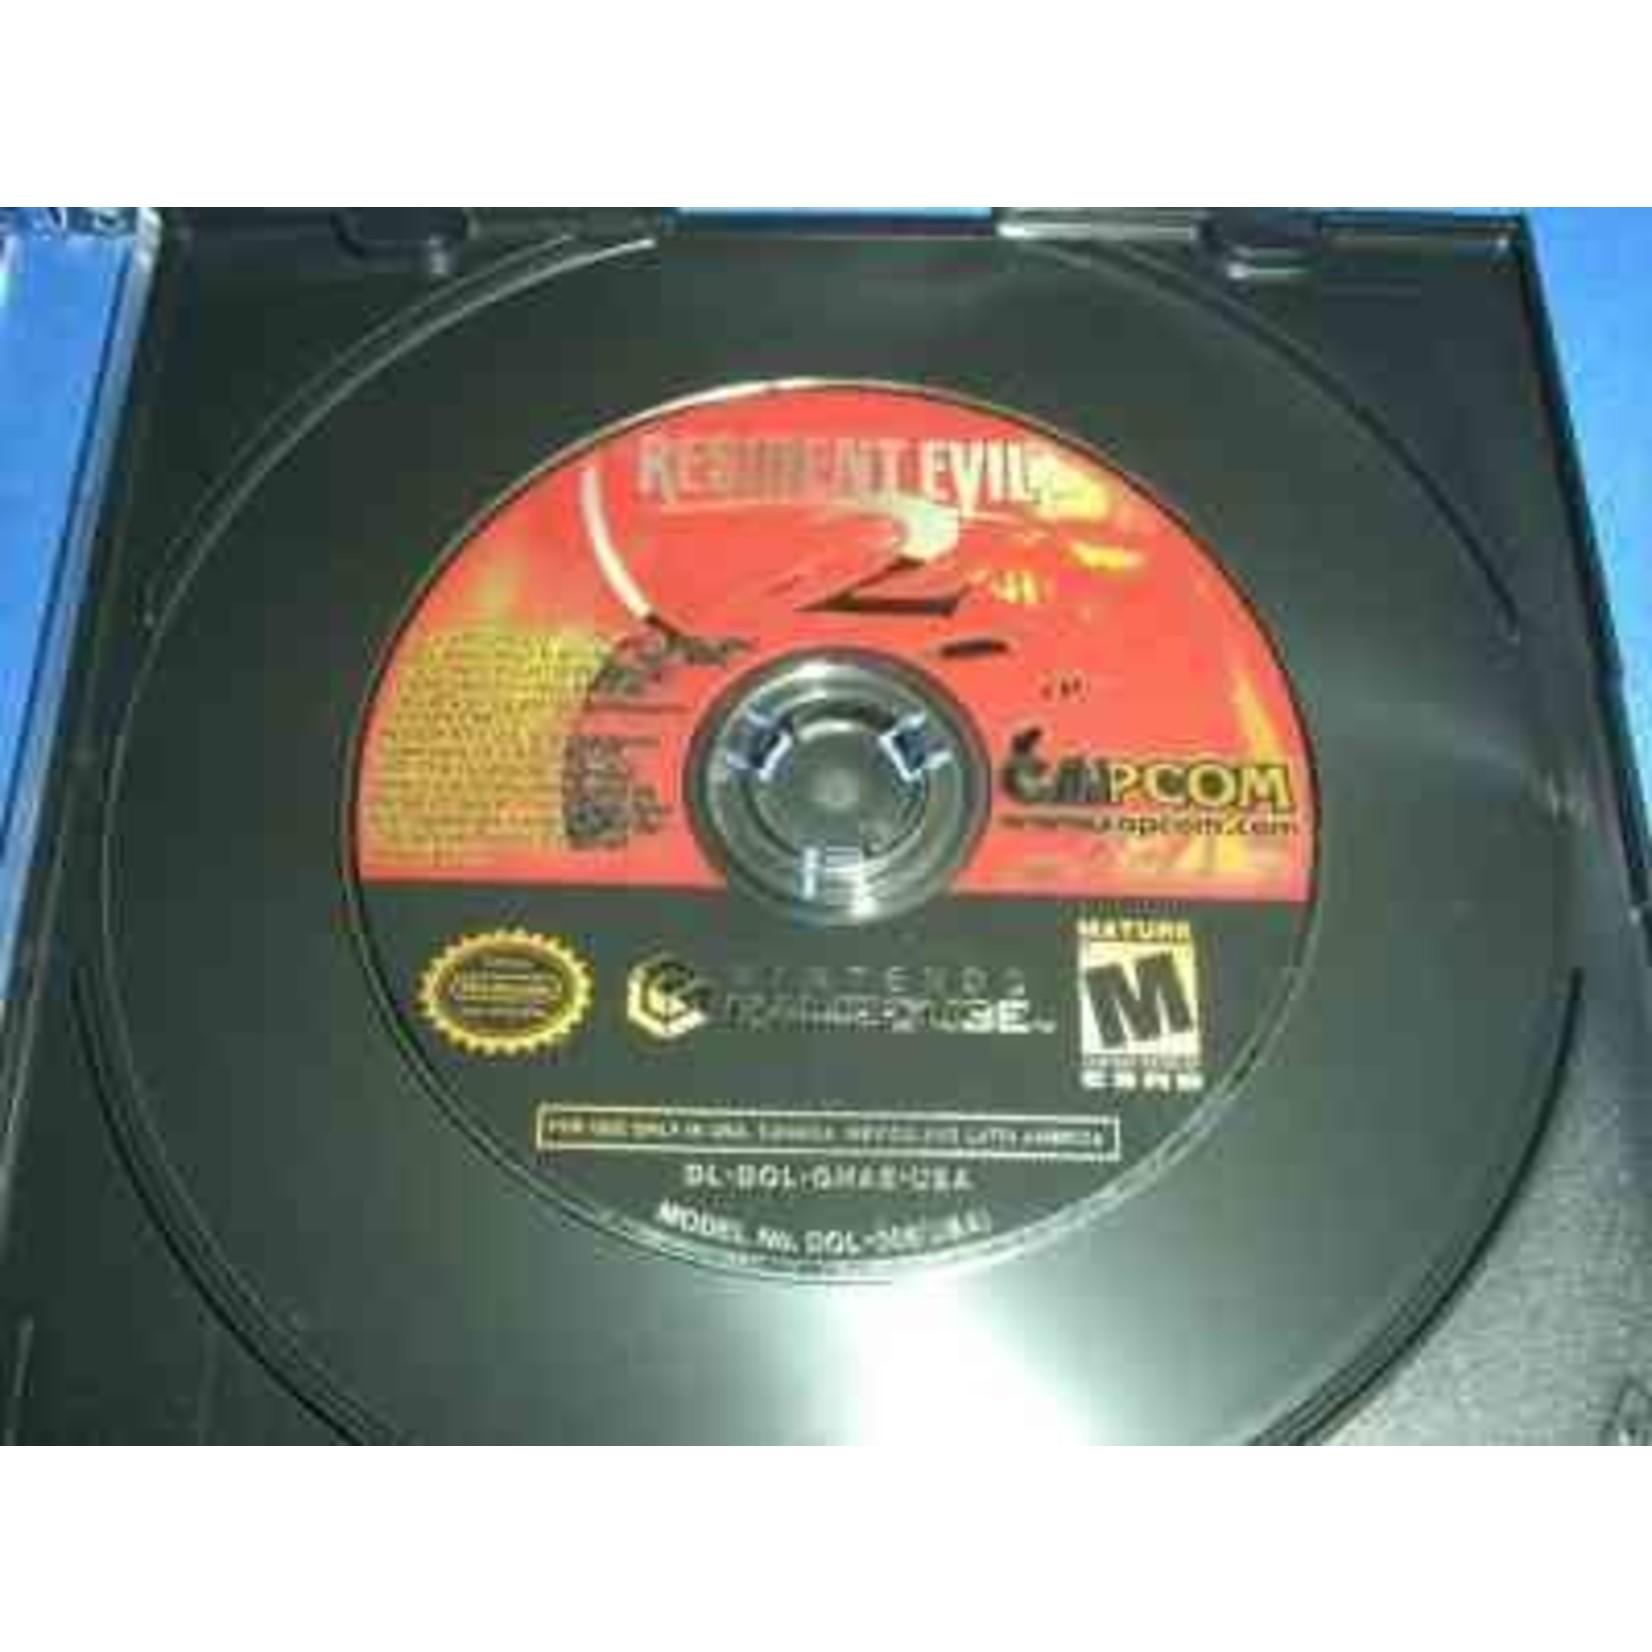 GCU-Resident Evil 2 (disc only)